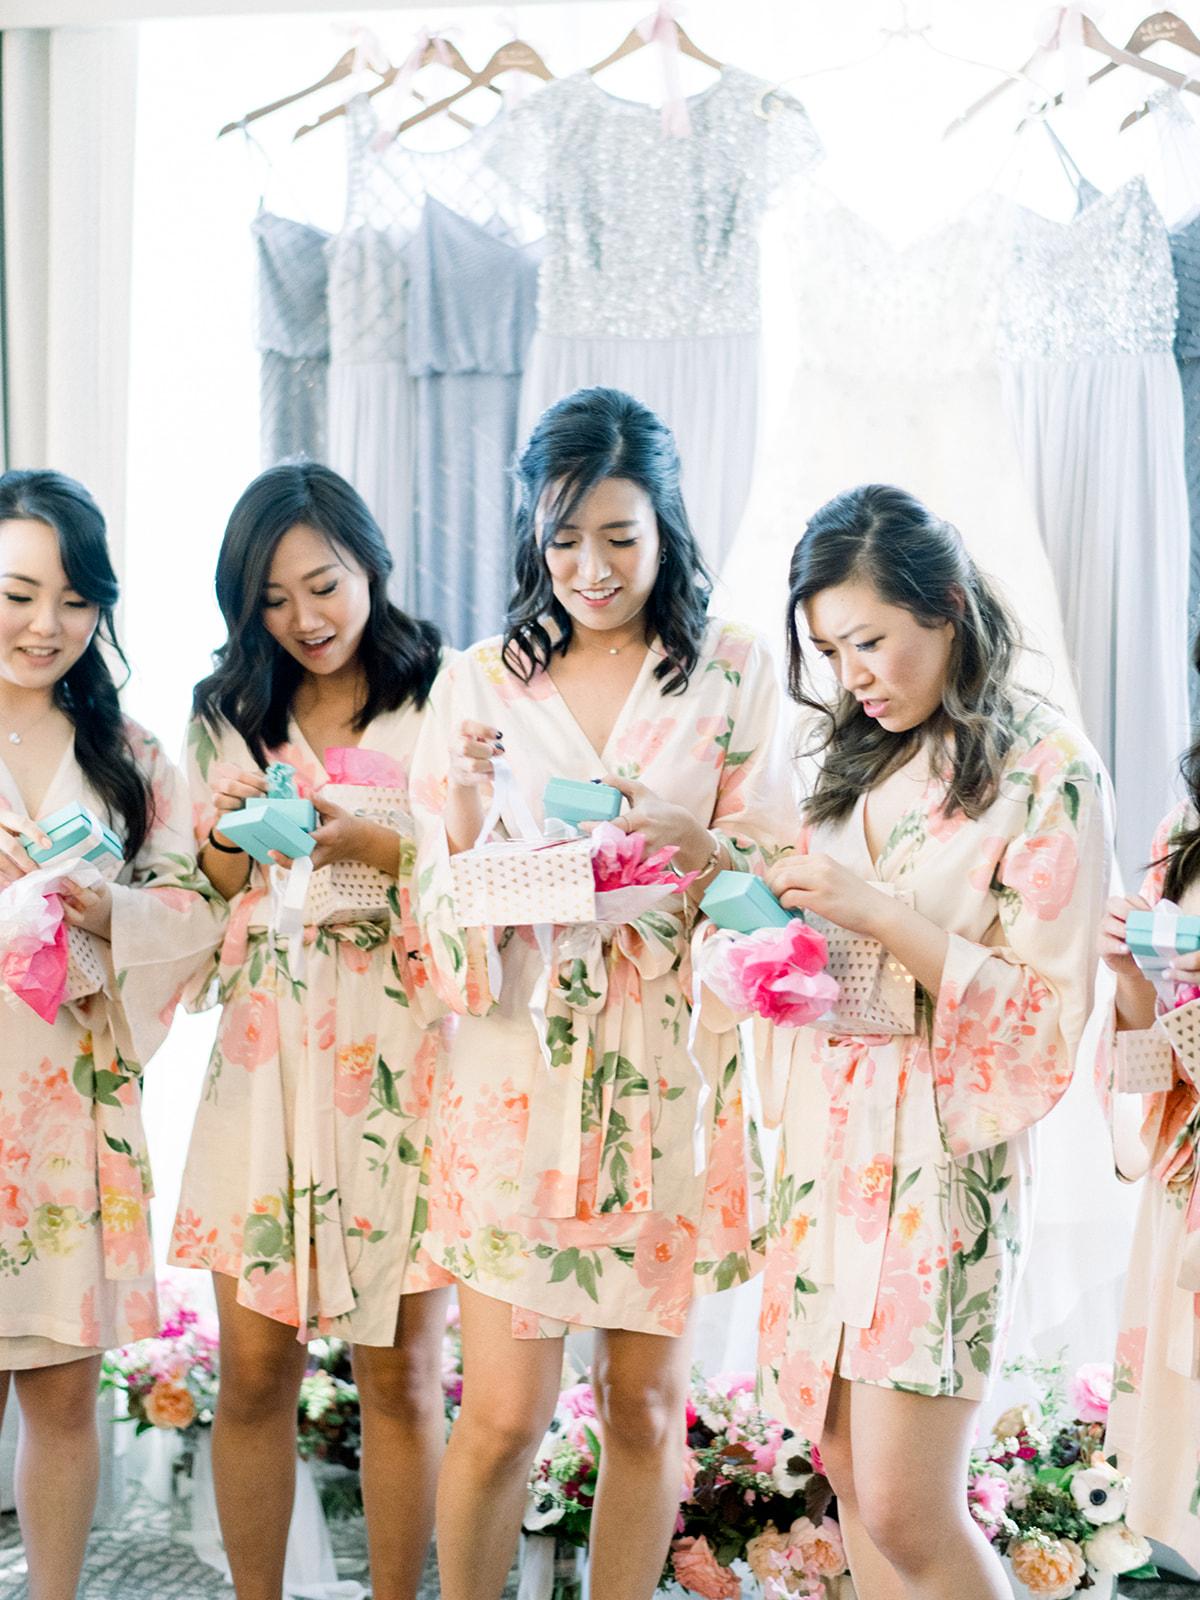 jueunandjon-etherandsmith-wedding-144.jpg